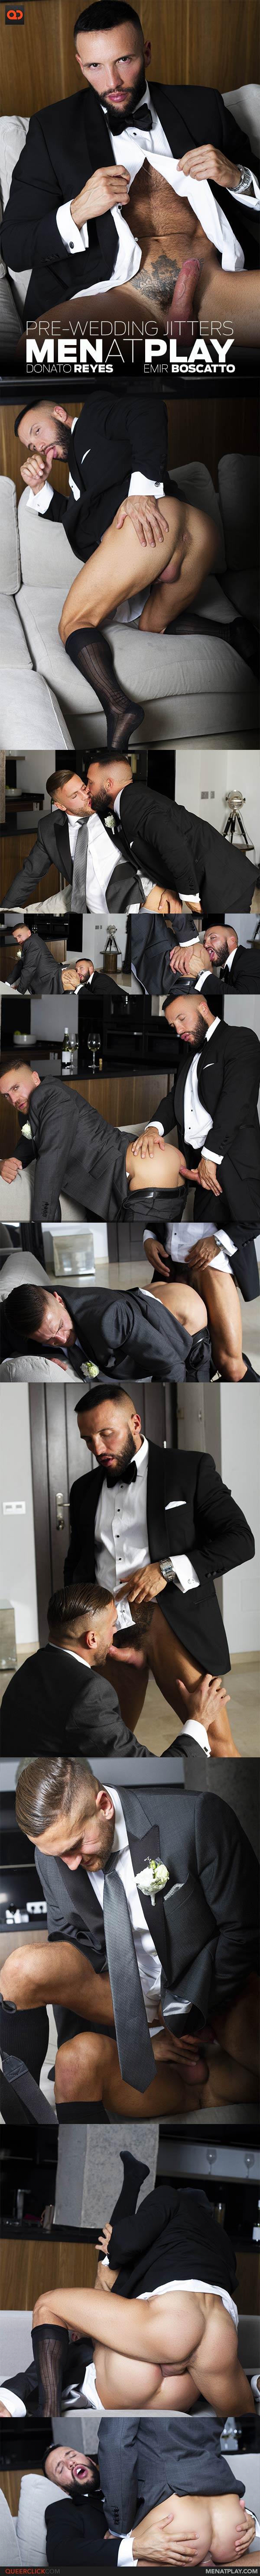 Passion Do Donato Reyes Porn menatplay: donato reyes and emir boscatto - queerclick